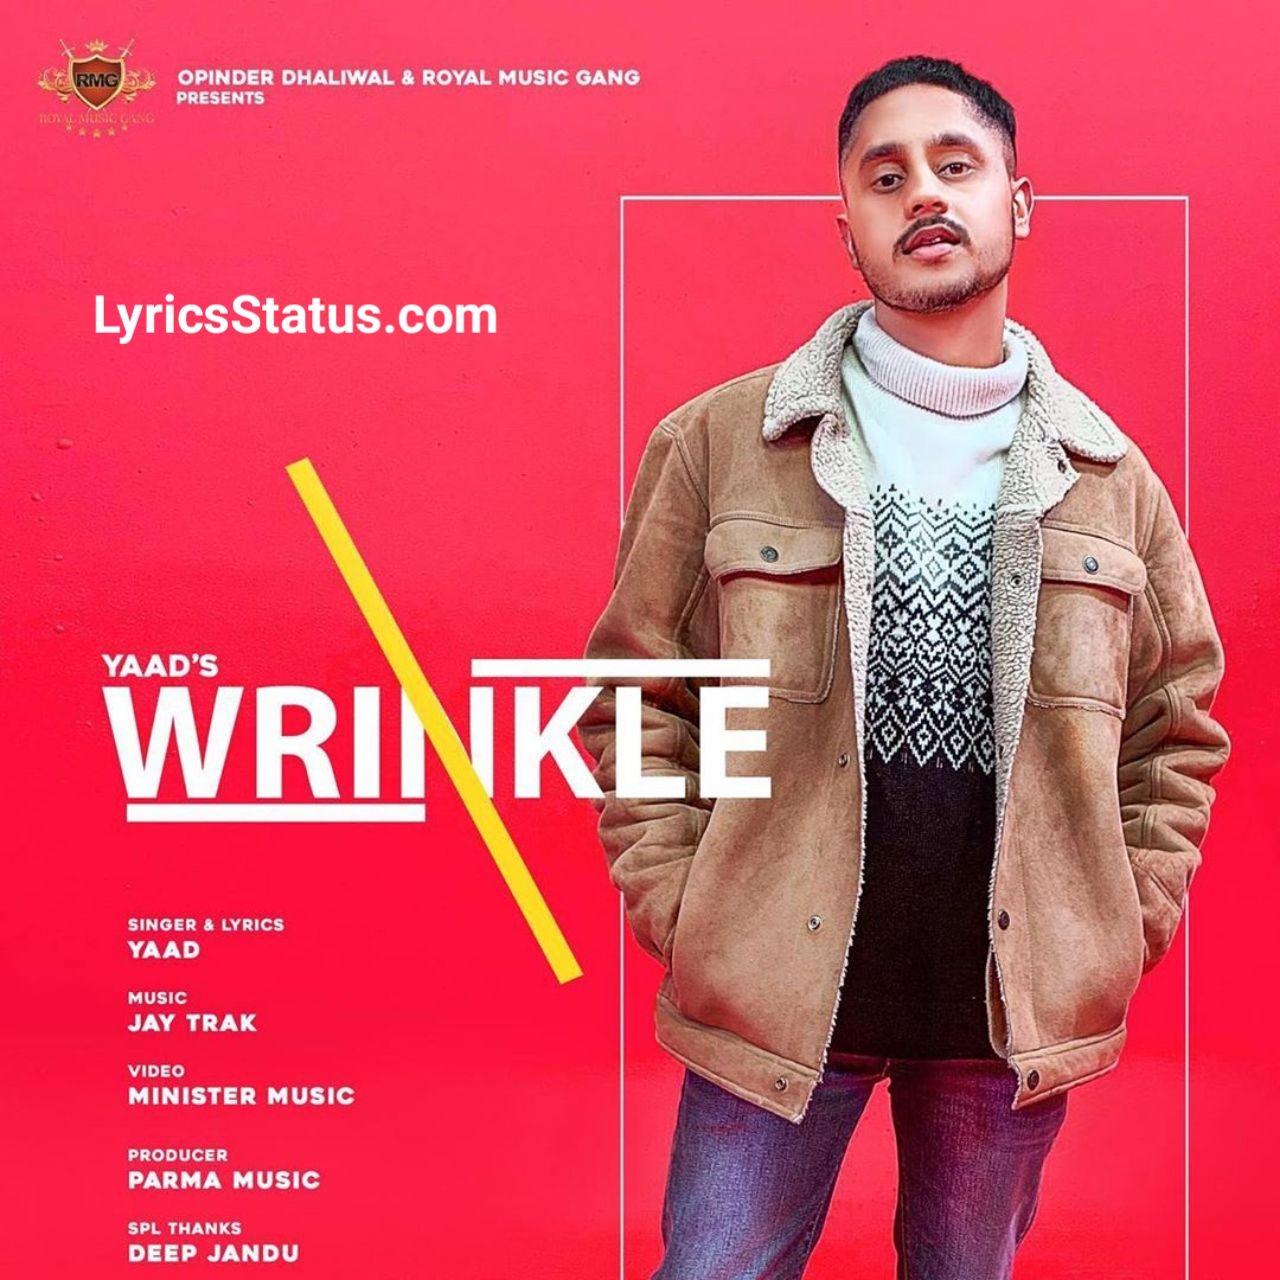 Yaad Wrinkle Karan Aujla Lyrics Status Download Video In 2020 Latest Song Lyrics Lyrics Royal Music